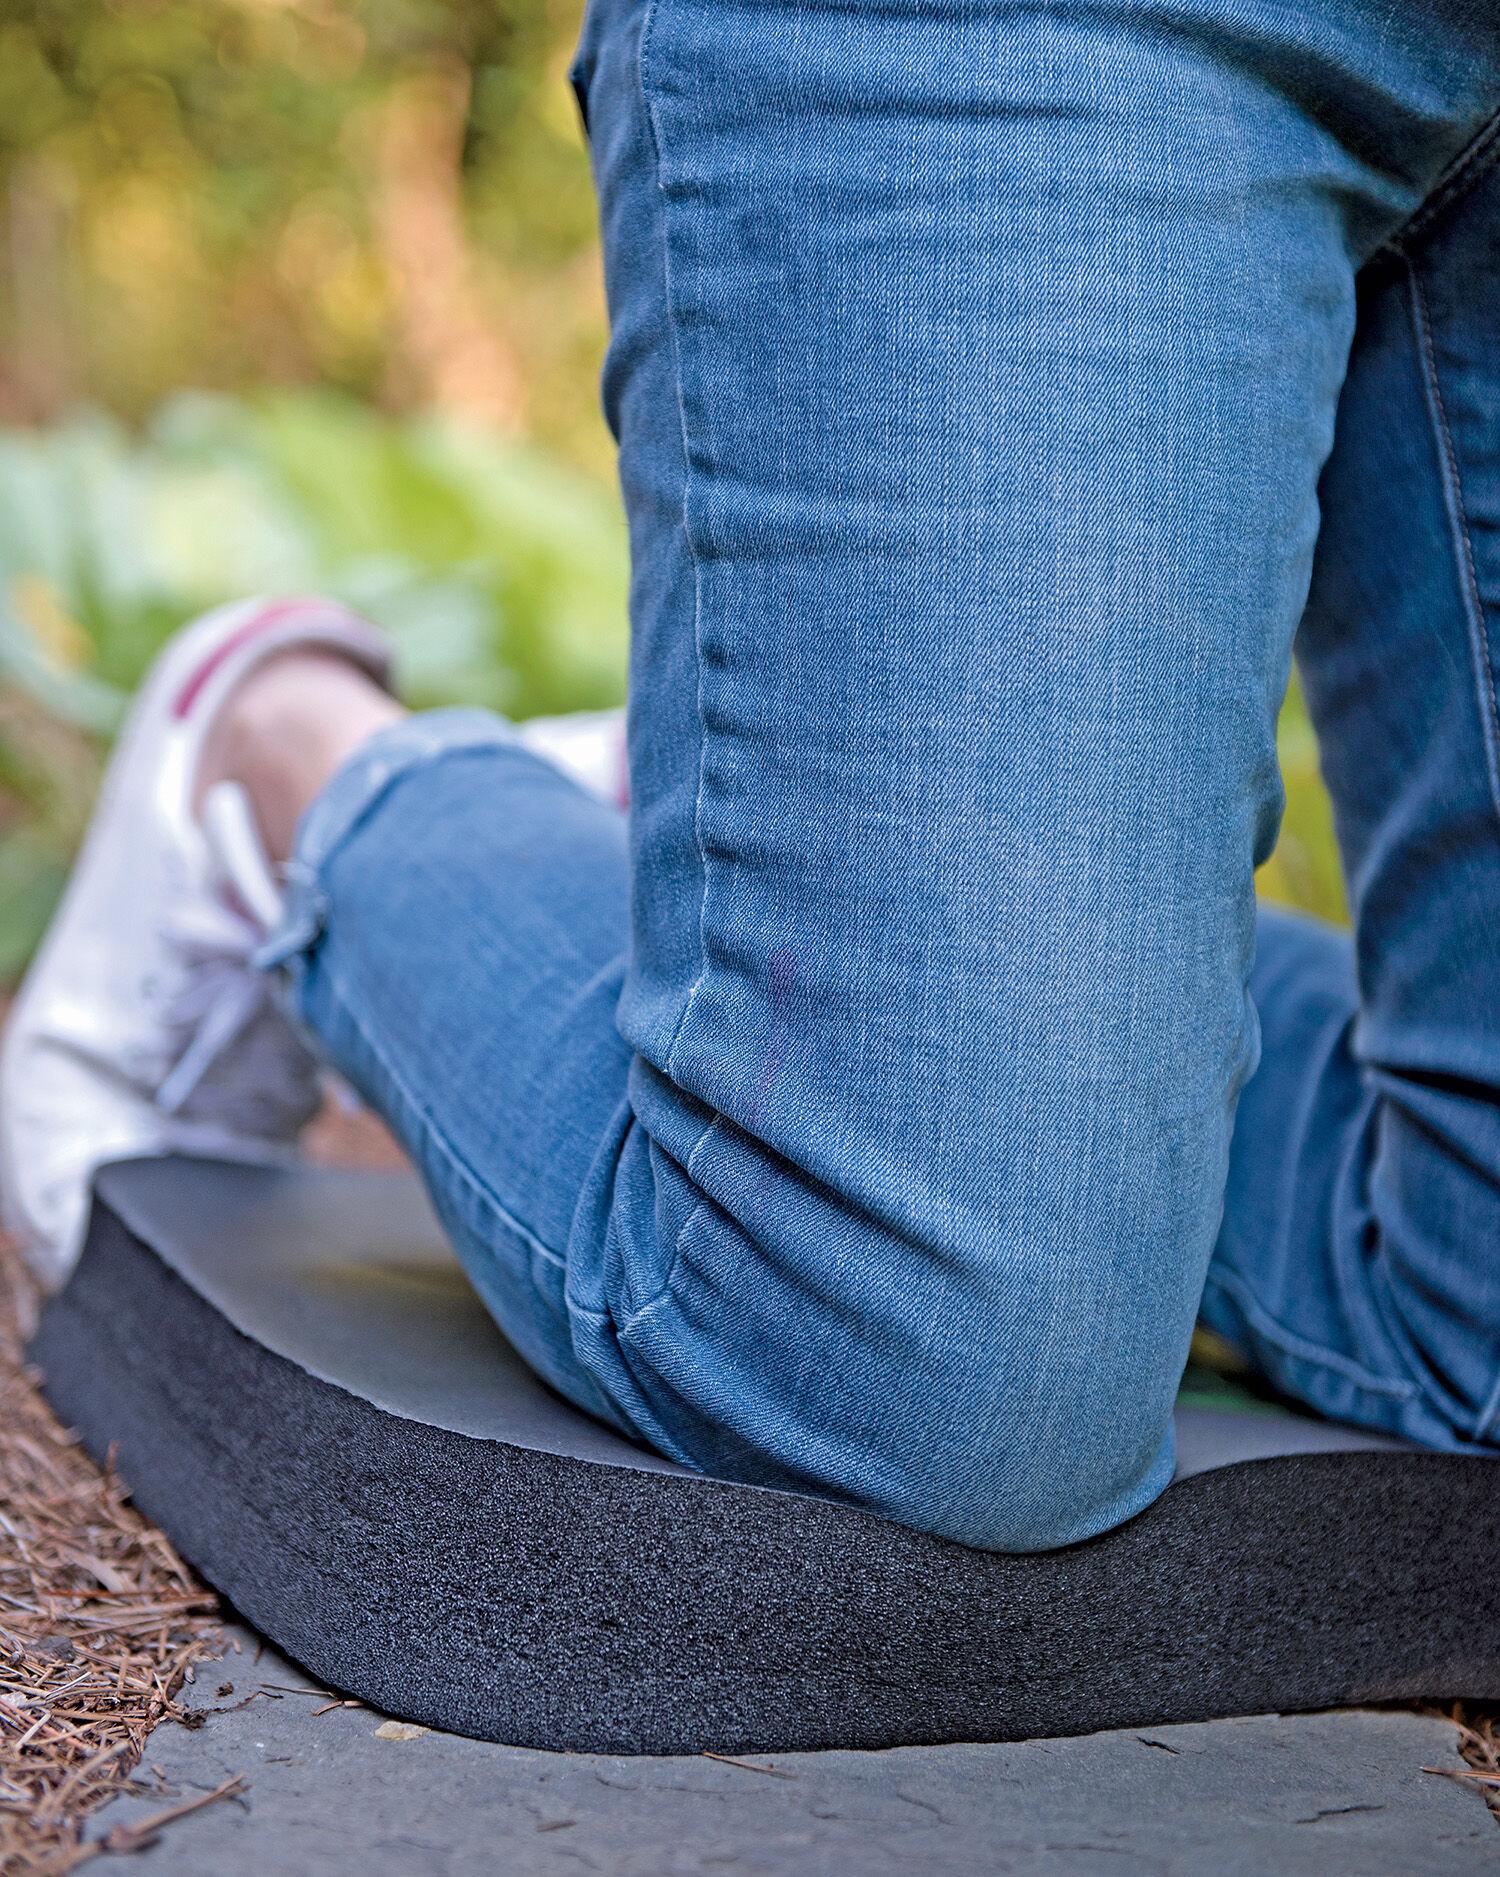 Gardening seat gardening chair low rider swivel scoot for Gardening kneeling pads